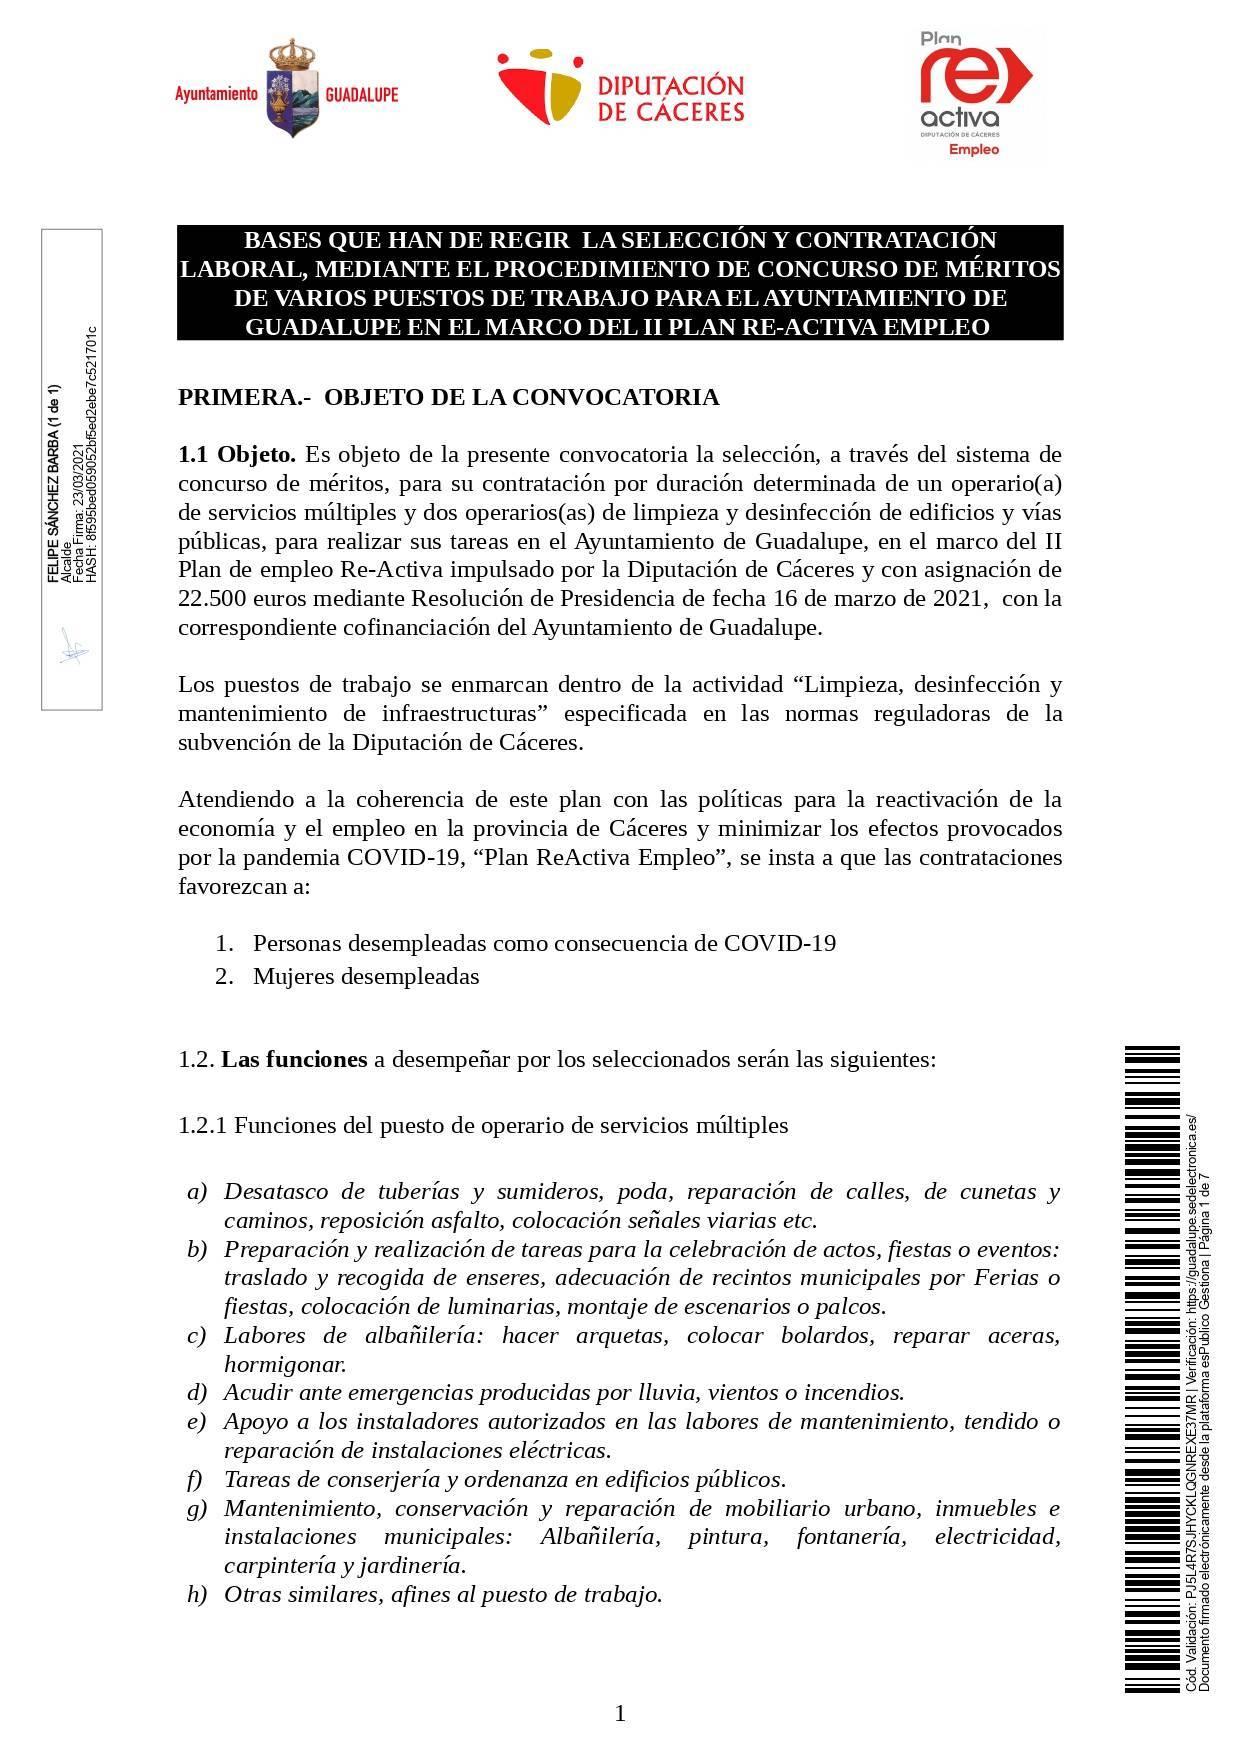 Un operario-a de servicios múltiples y dos operarios-as de limpieza (2021) - Guadalupe (Cáceres) 1